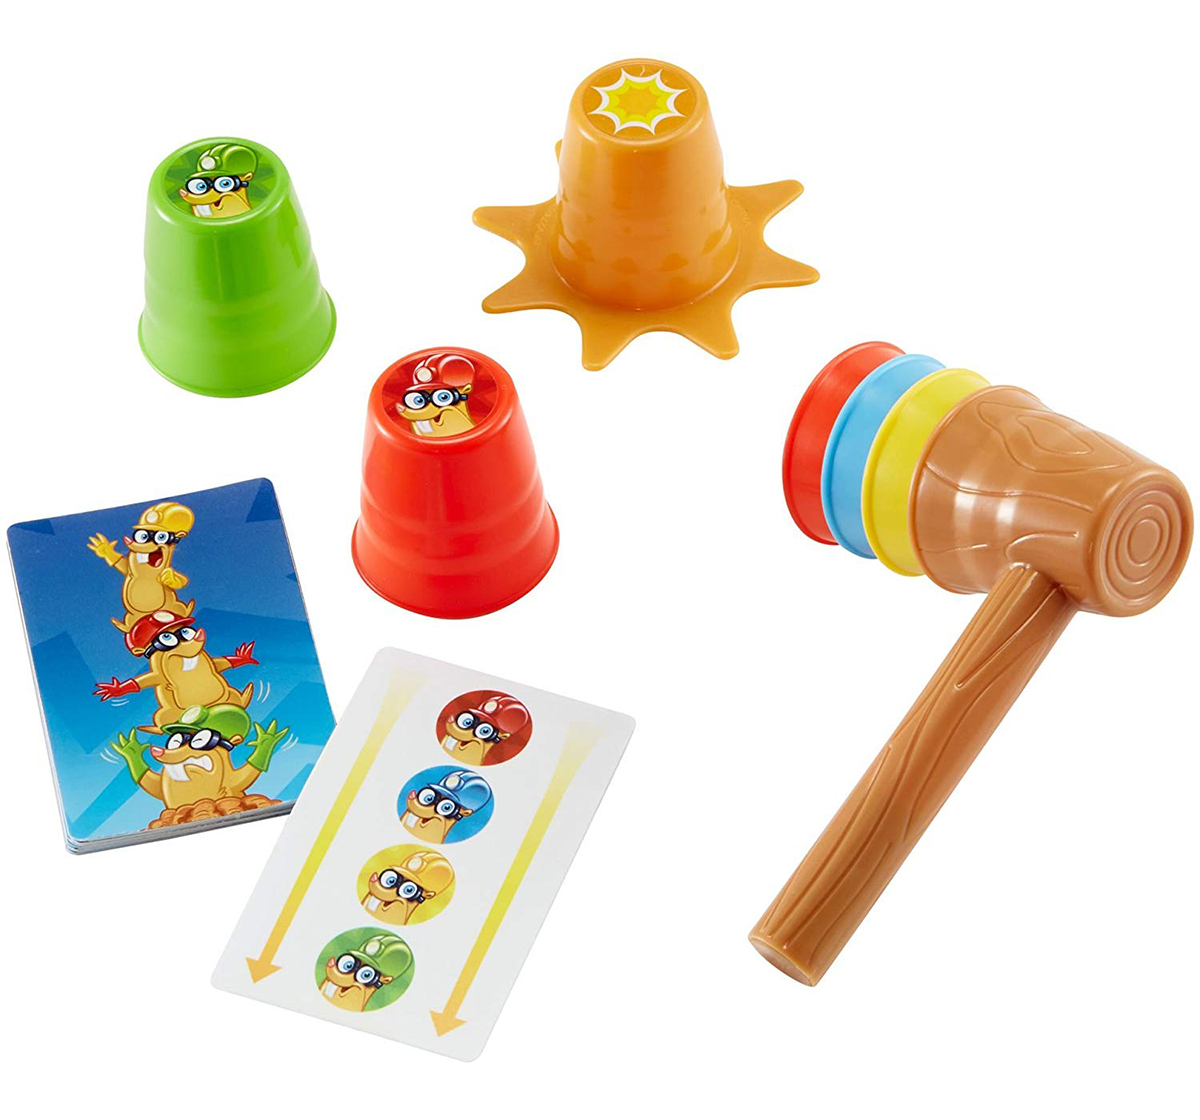 Mattel | Mattel Games Fast Fun Wack A Mole Games for Kids age 3Y+